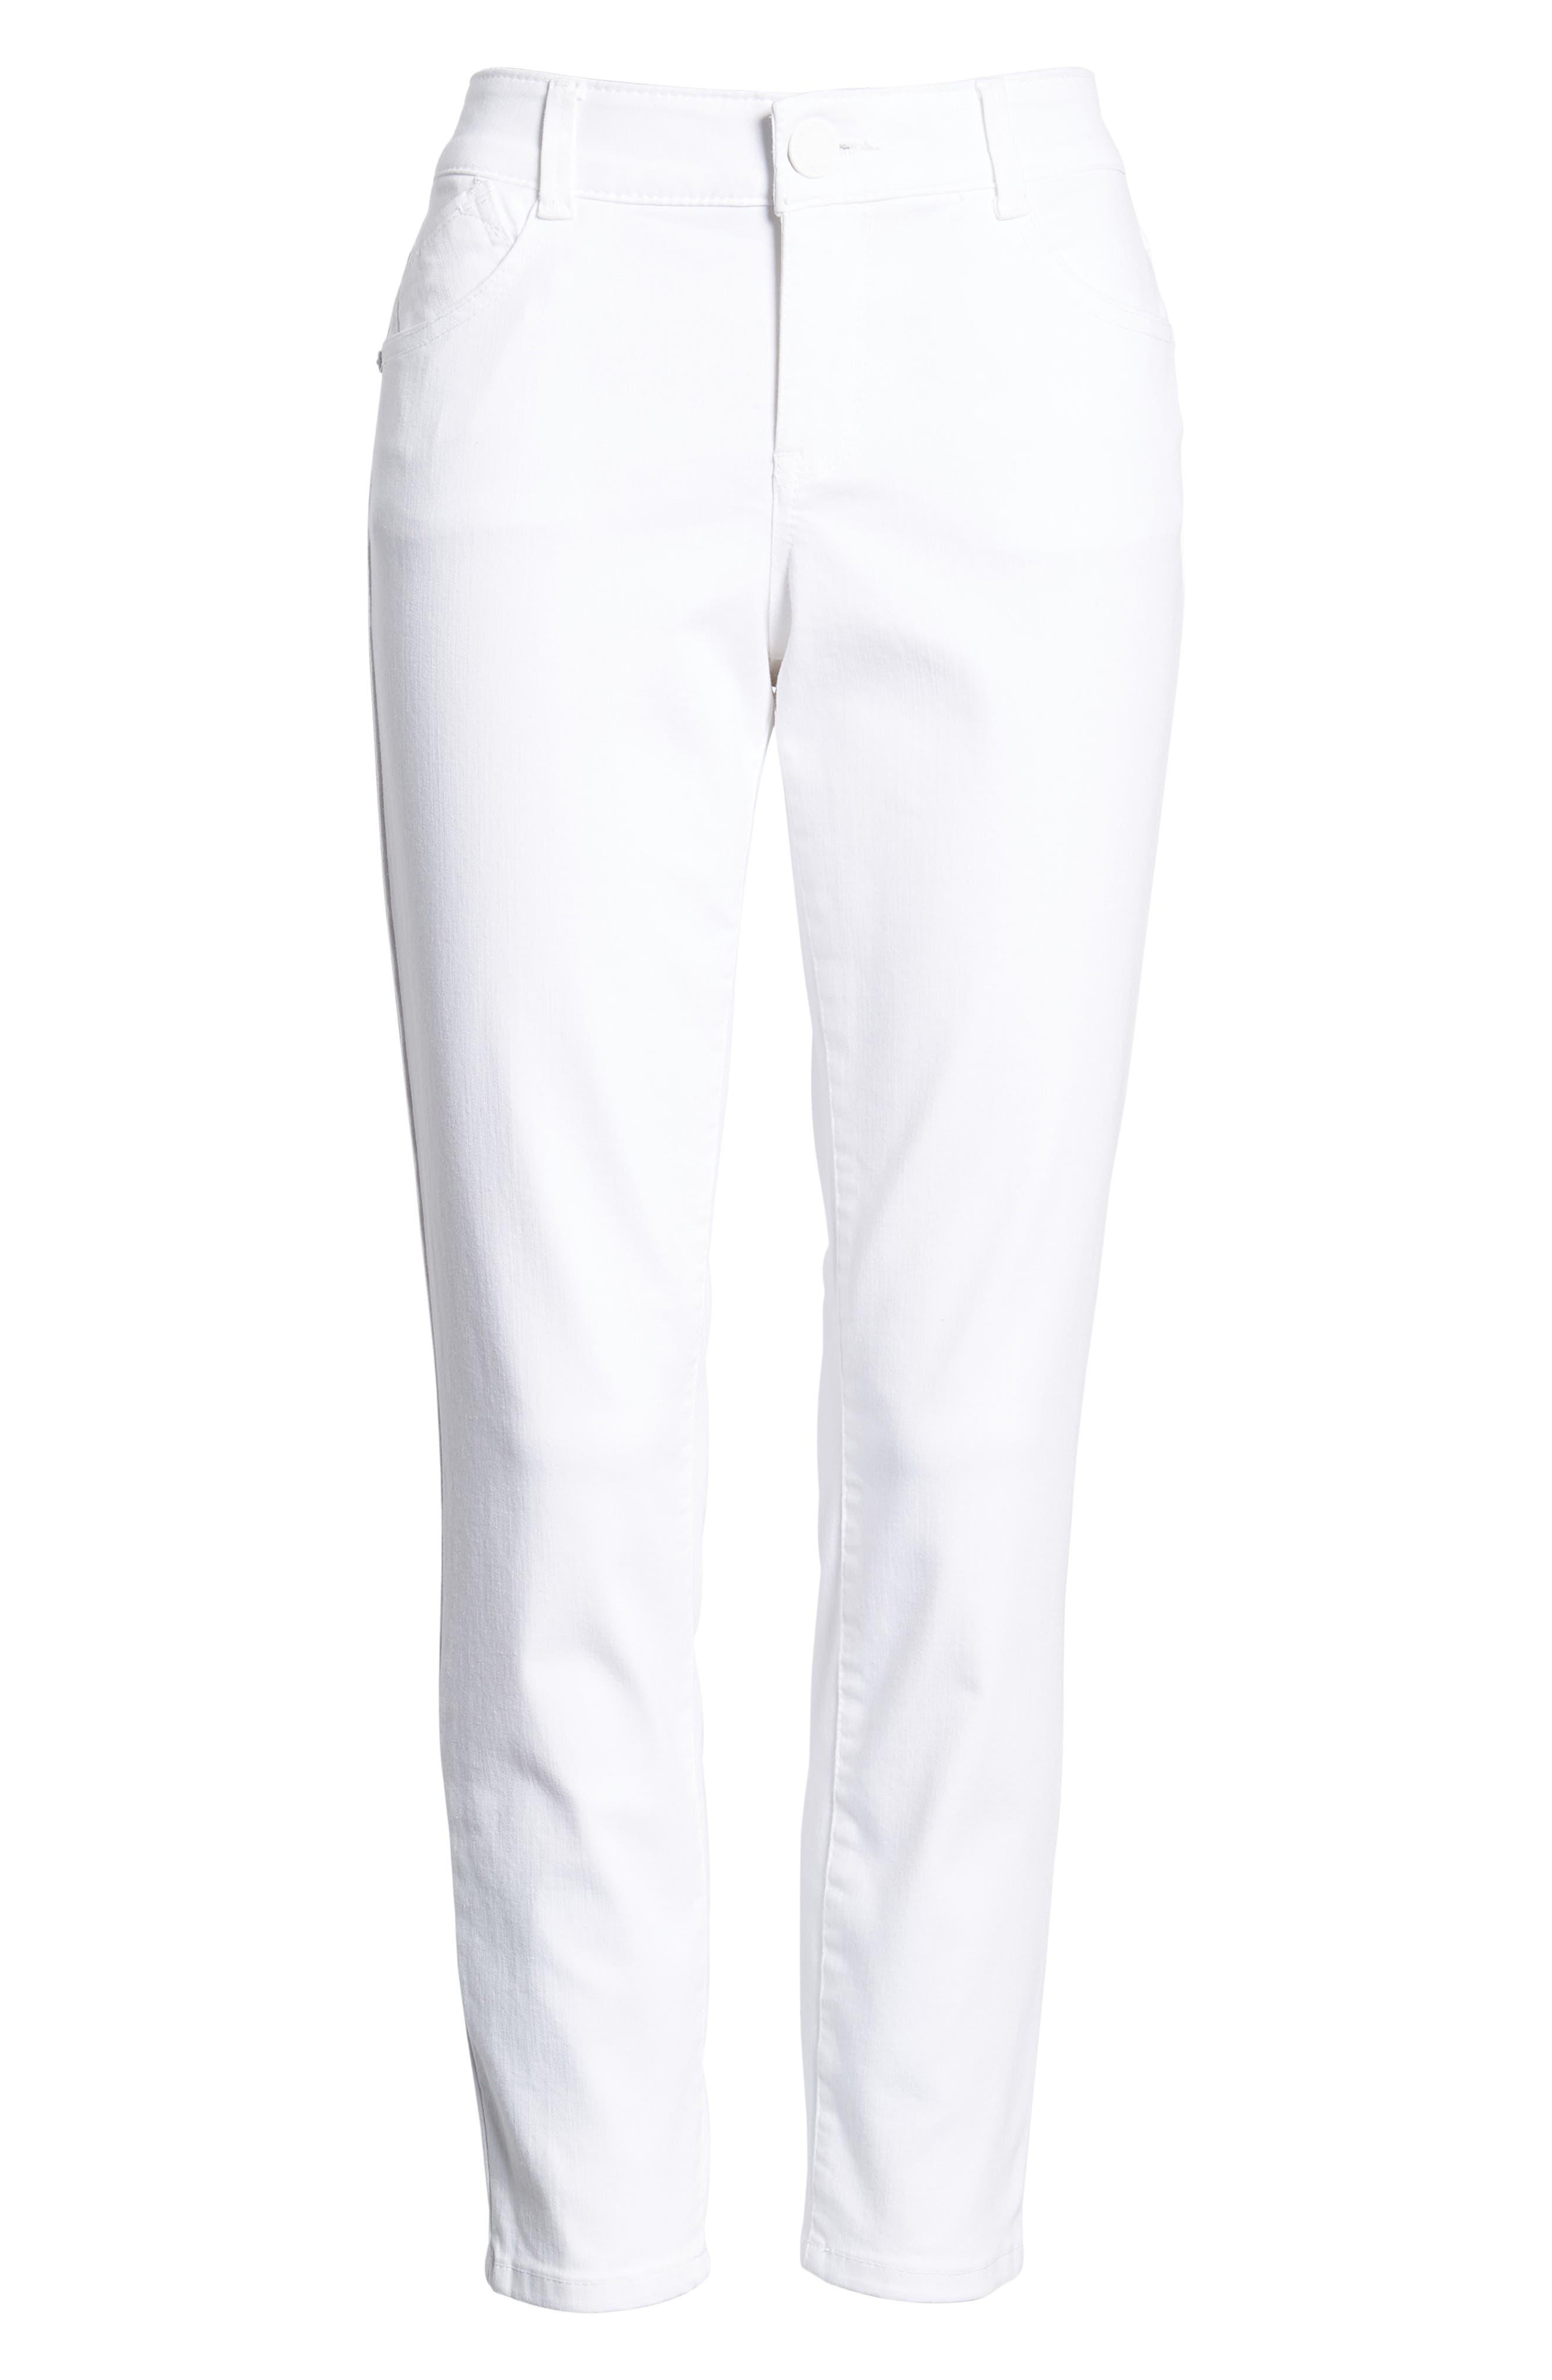 Ab-solution Ankle Skimmer Jeans,                             Alternate thumbnail 7, color,                             Optic White